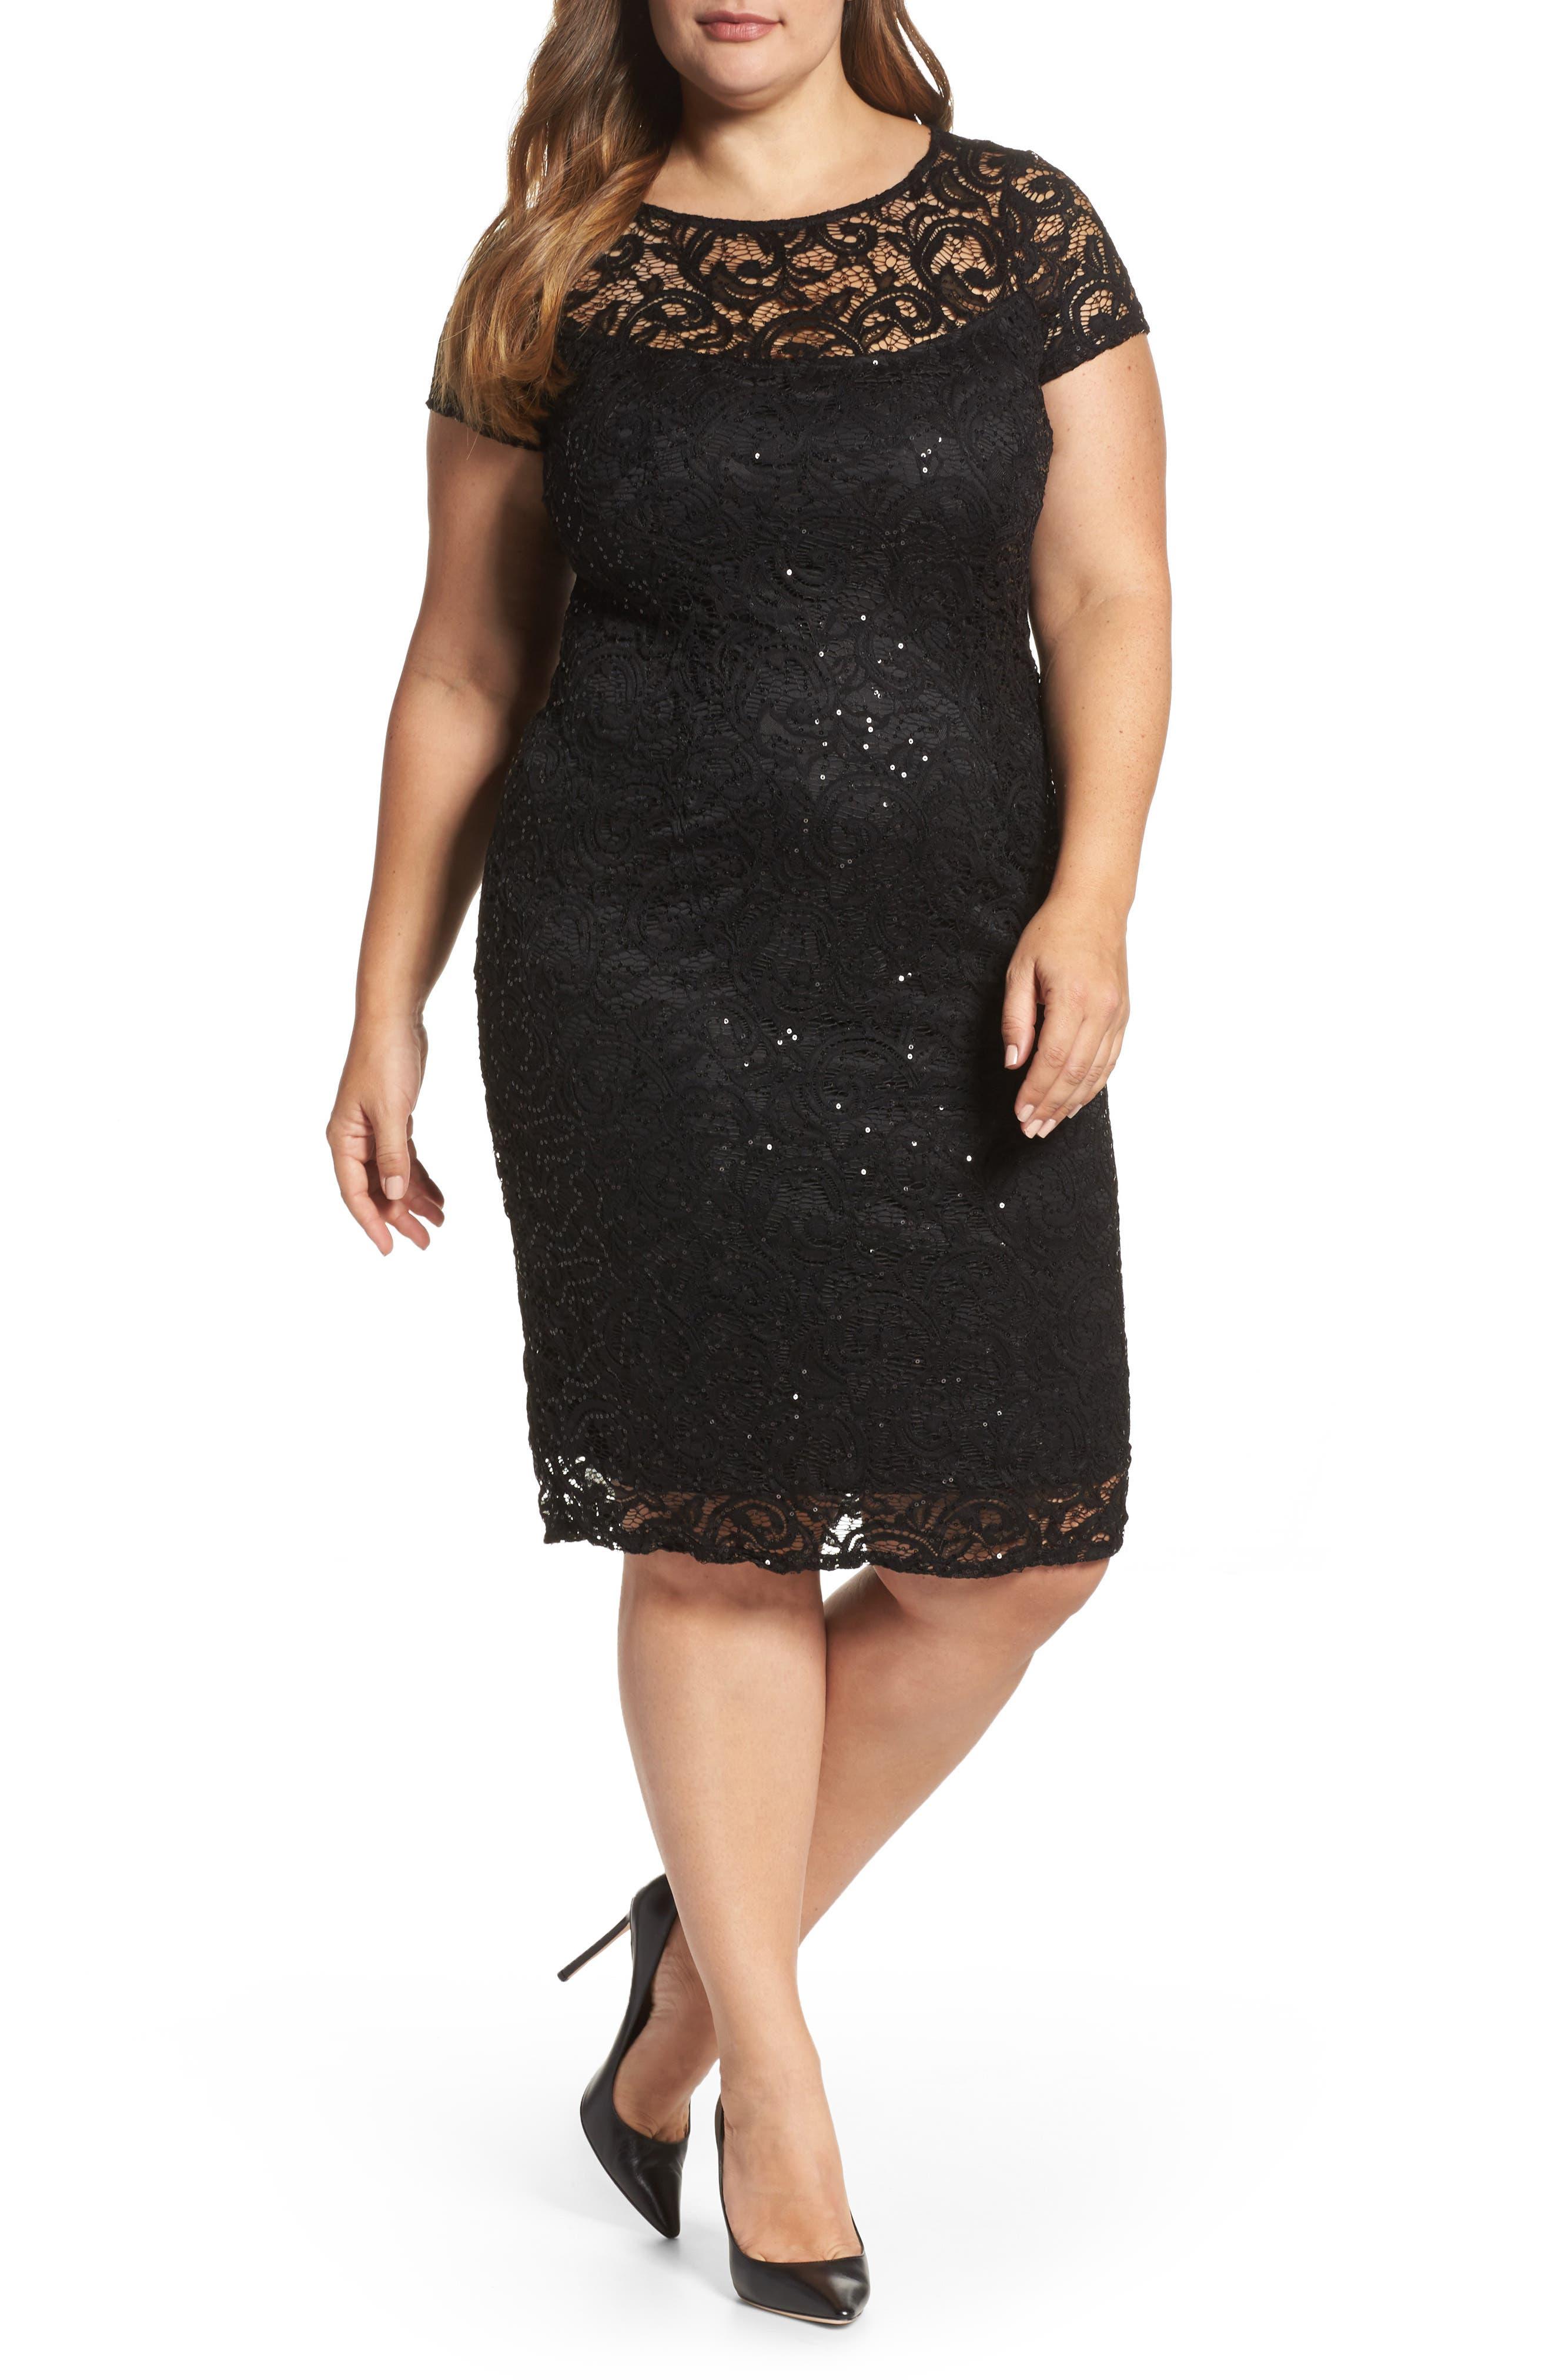 Alternate Image 1 Selected - Marina Sequin Lace Sheath Dress (Plus Size)